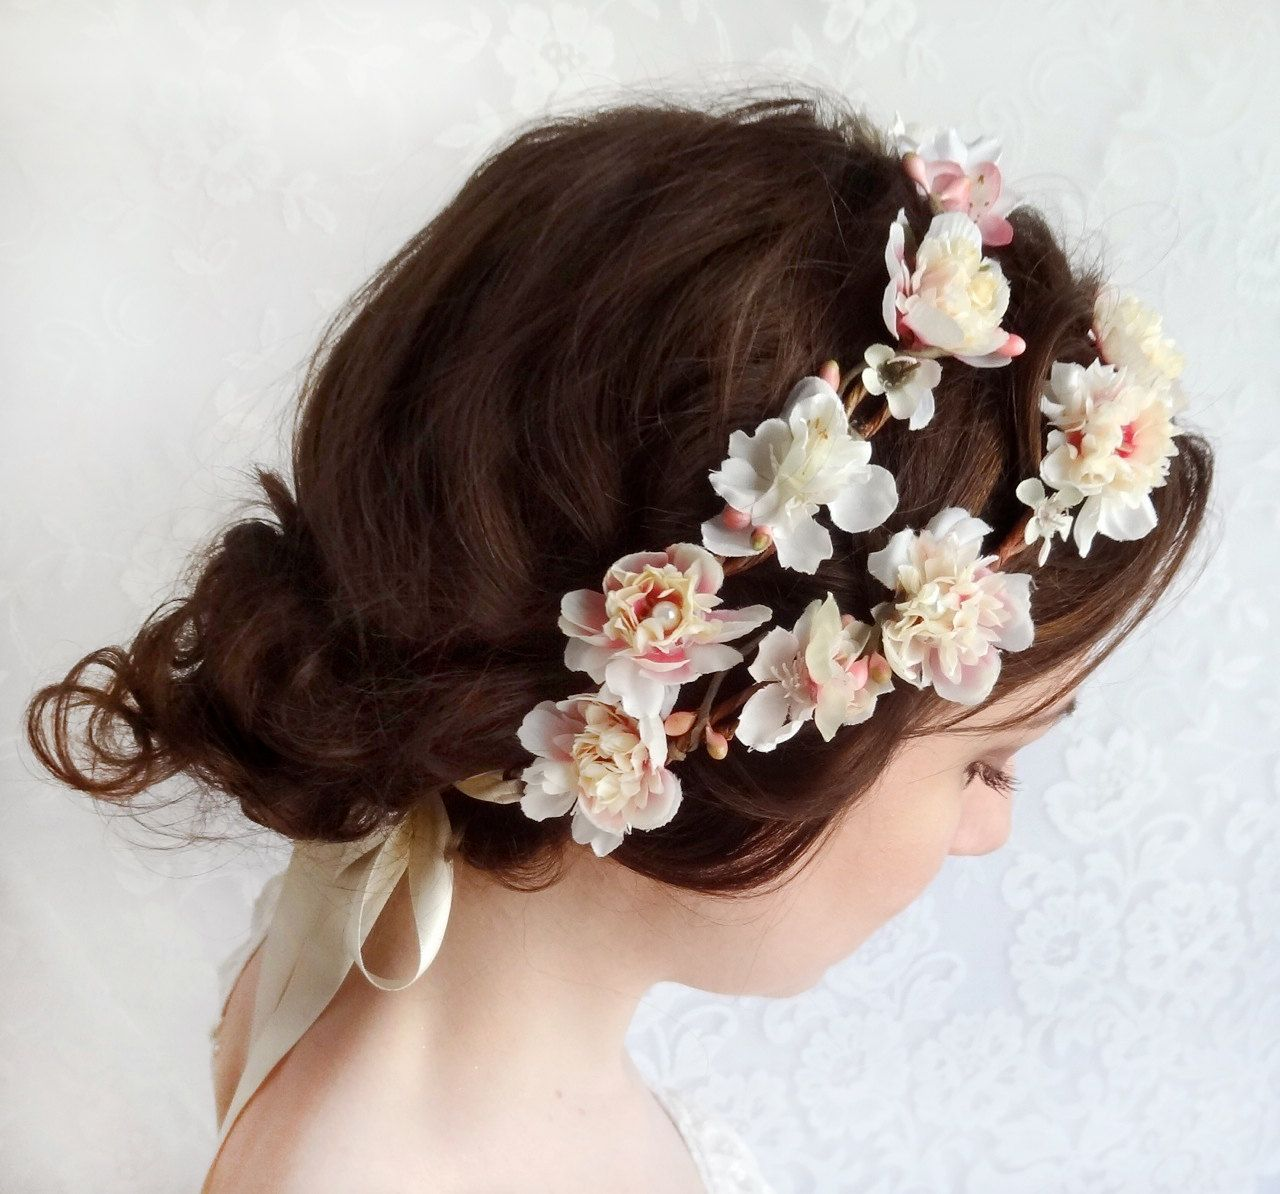 Ivory Flower Hair Clip Wedding: Cream Wedding Hair Accessories, Ivory Flower Hair Wreath